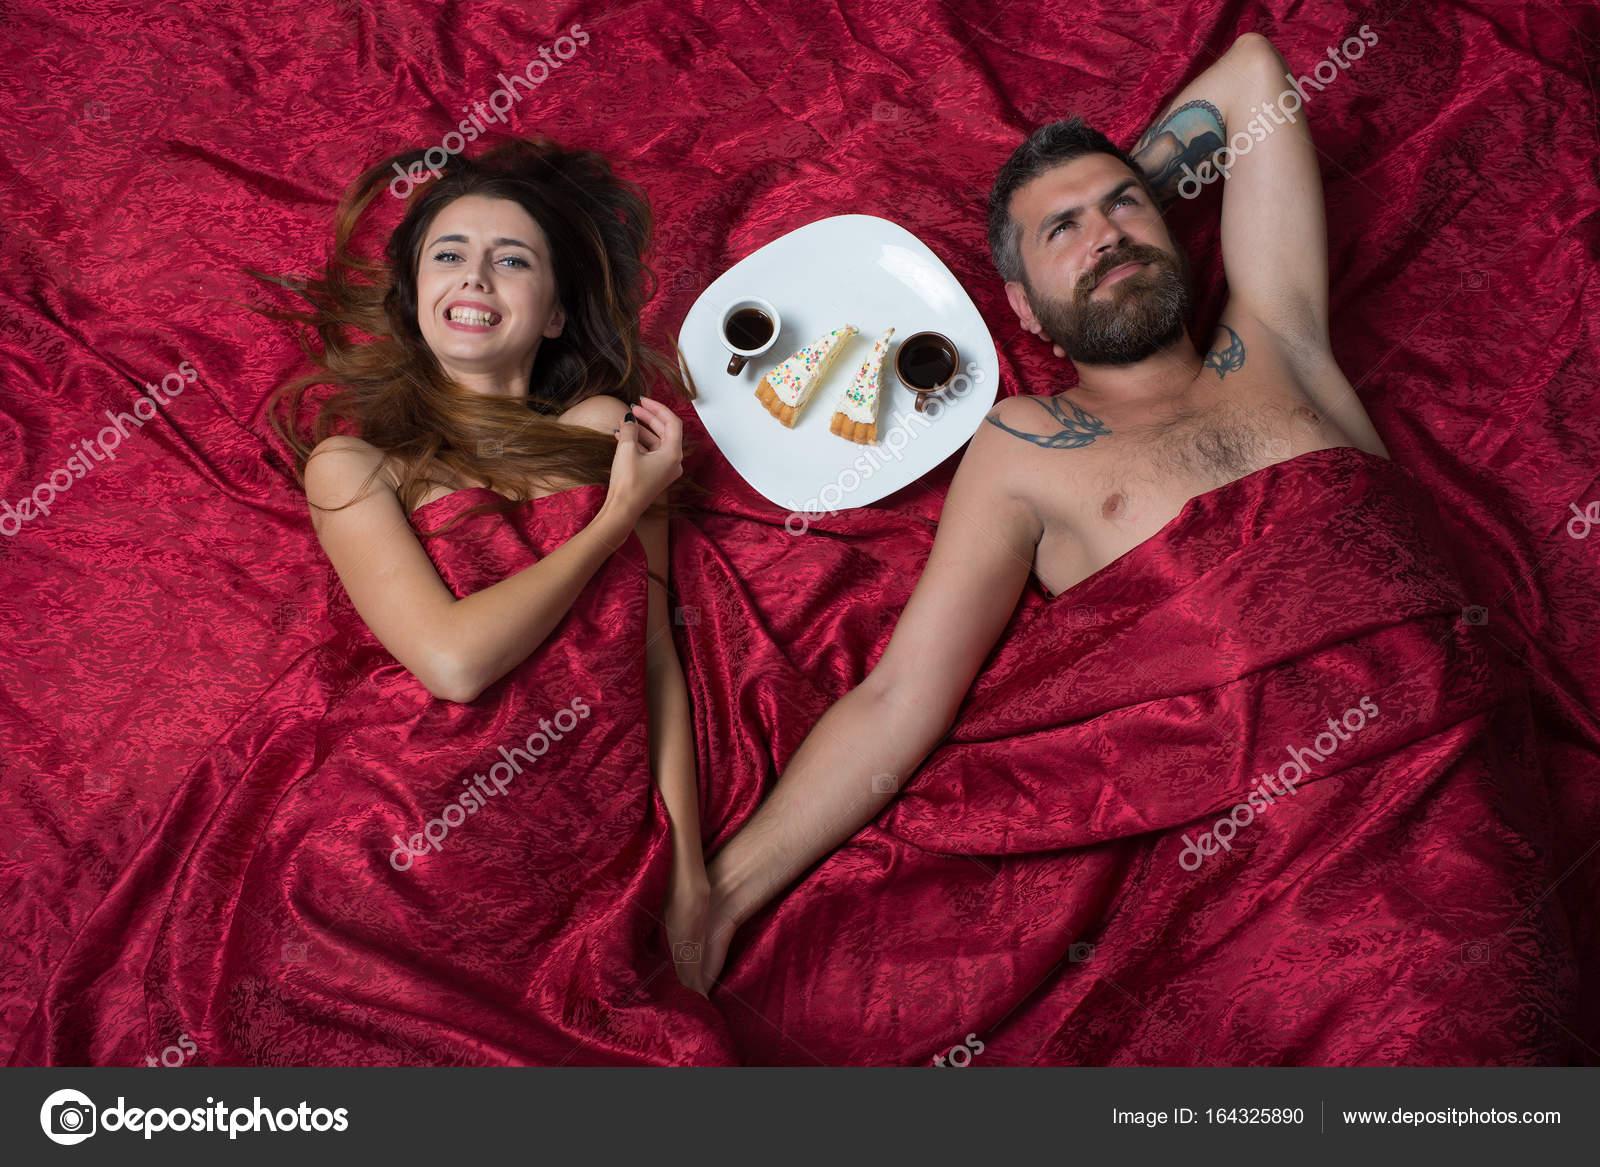 Мужчина женщина исекс